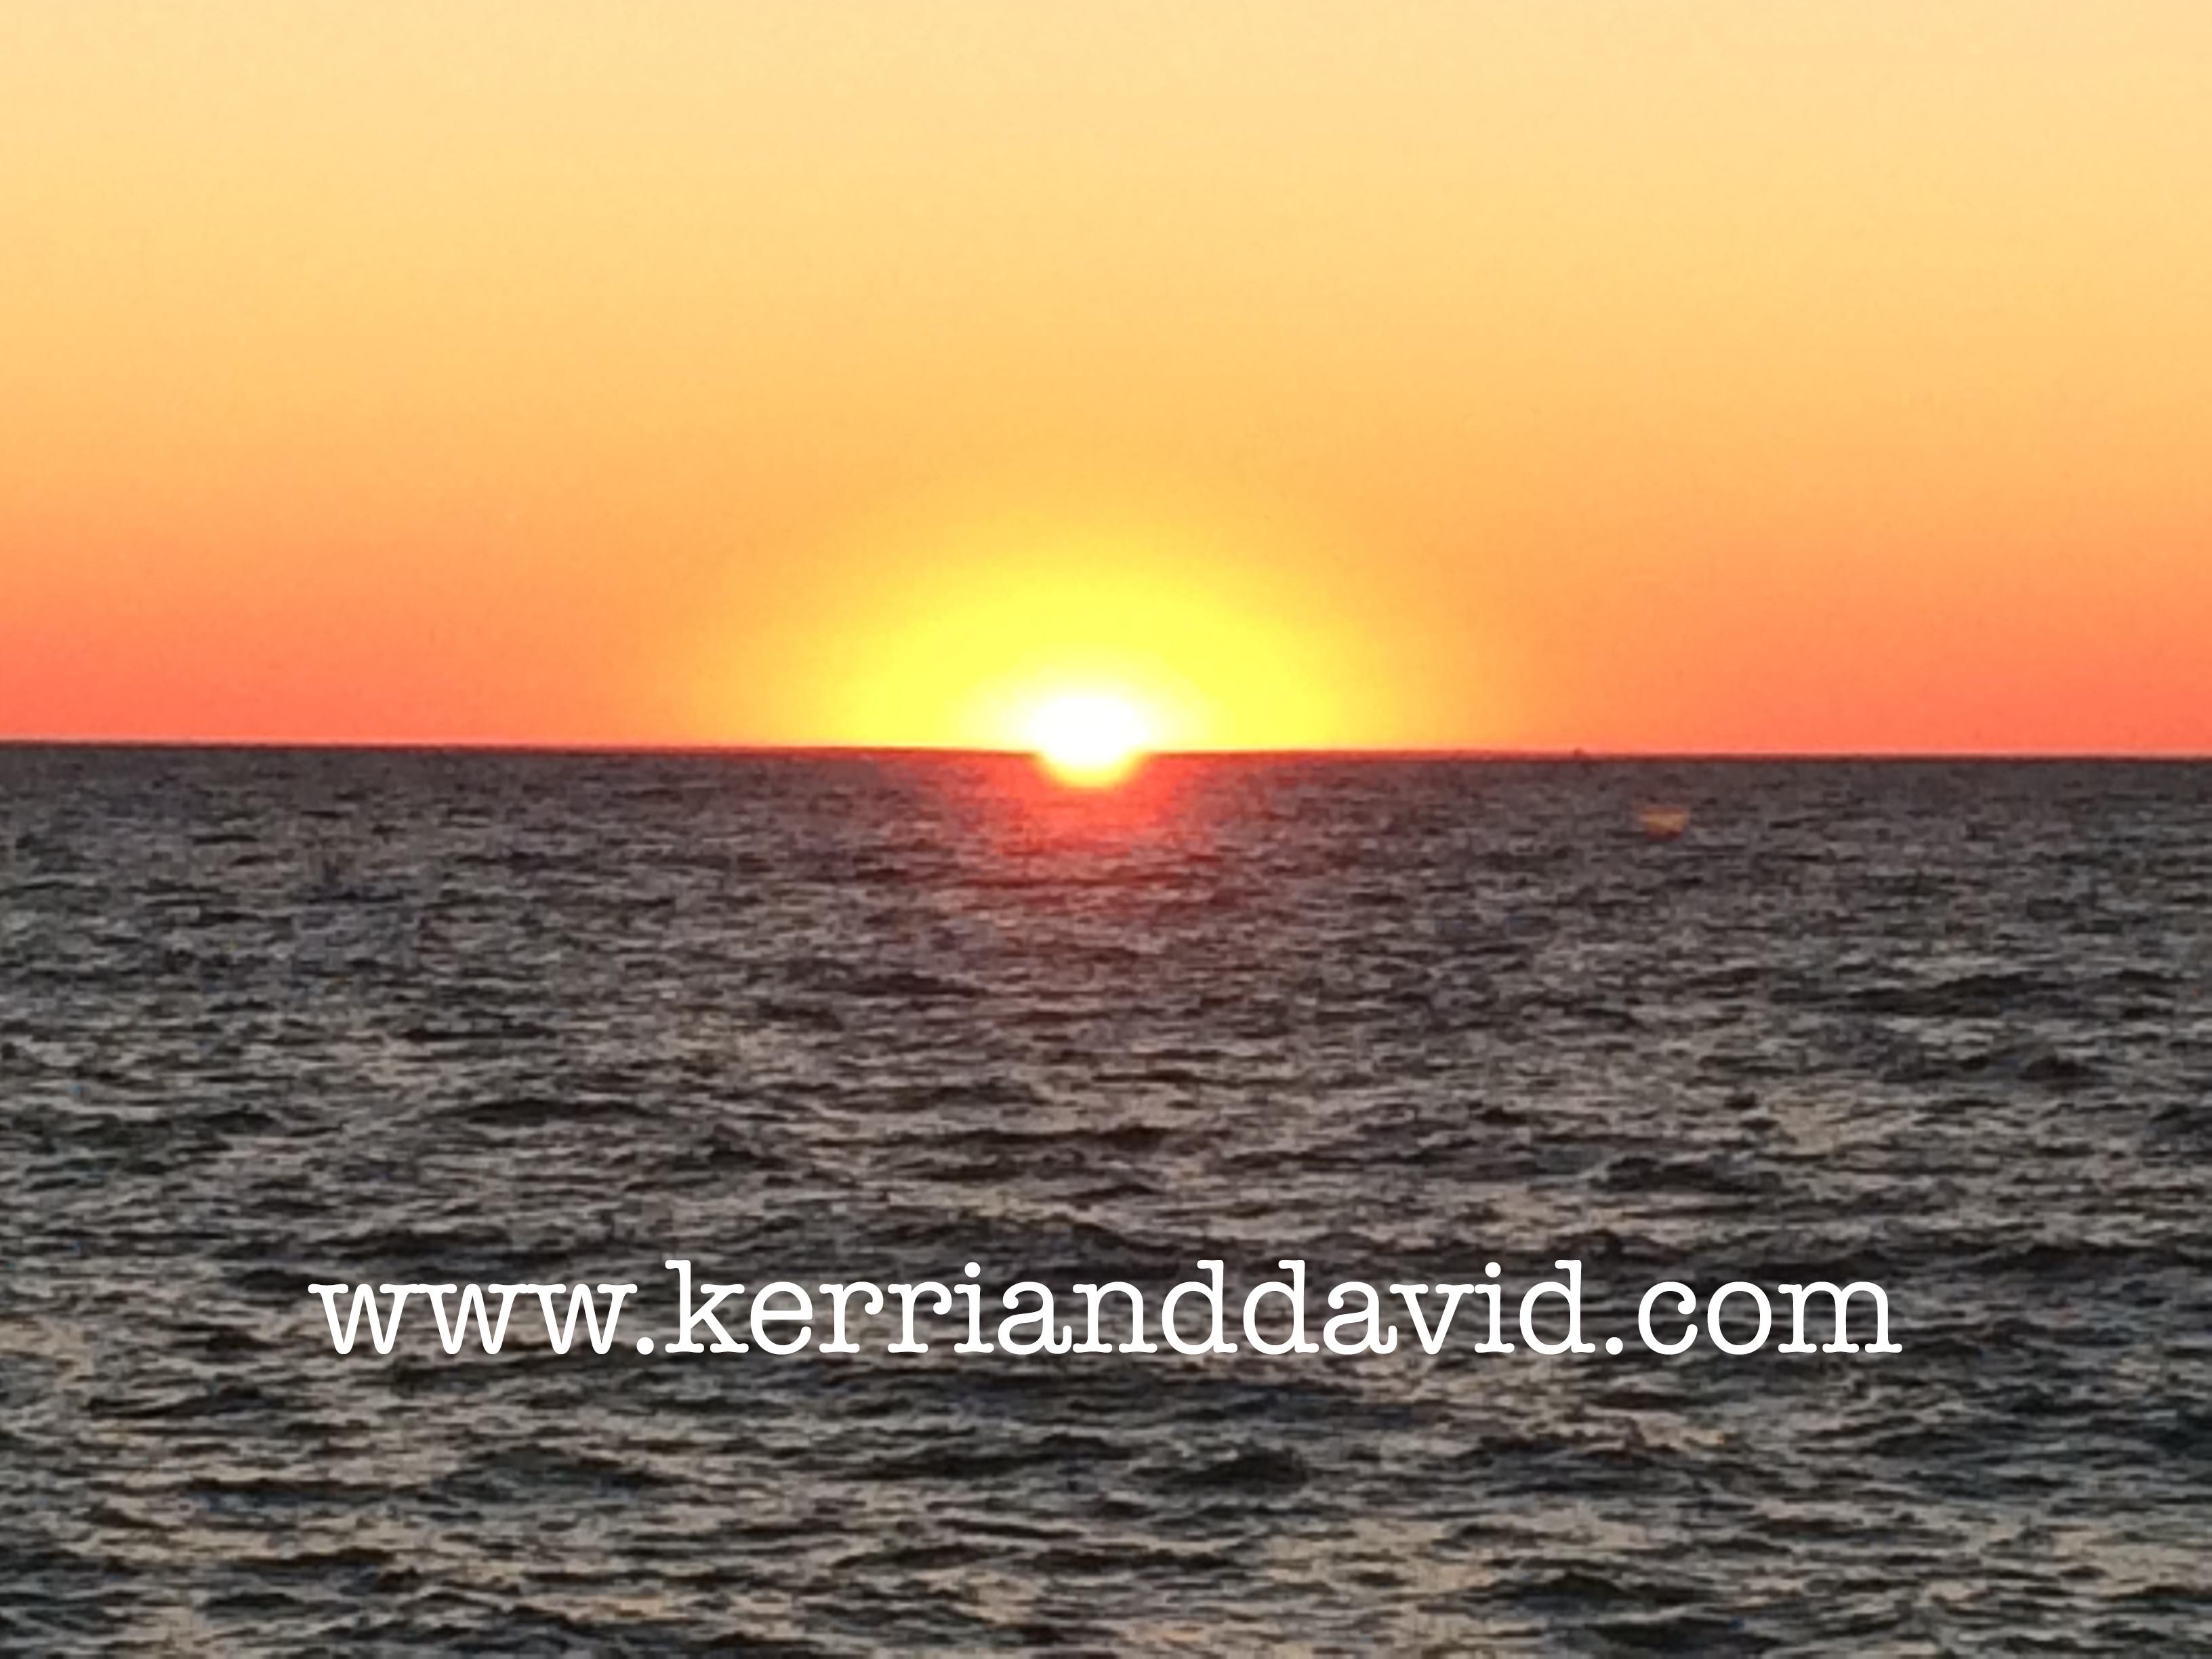 sunrisewebsite